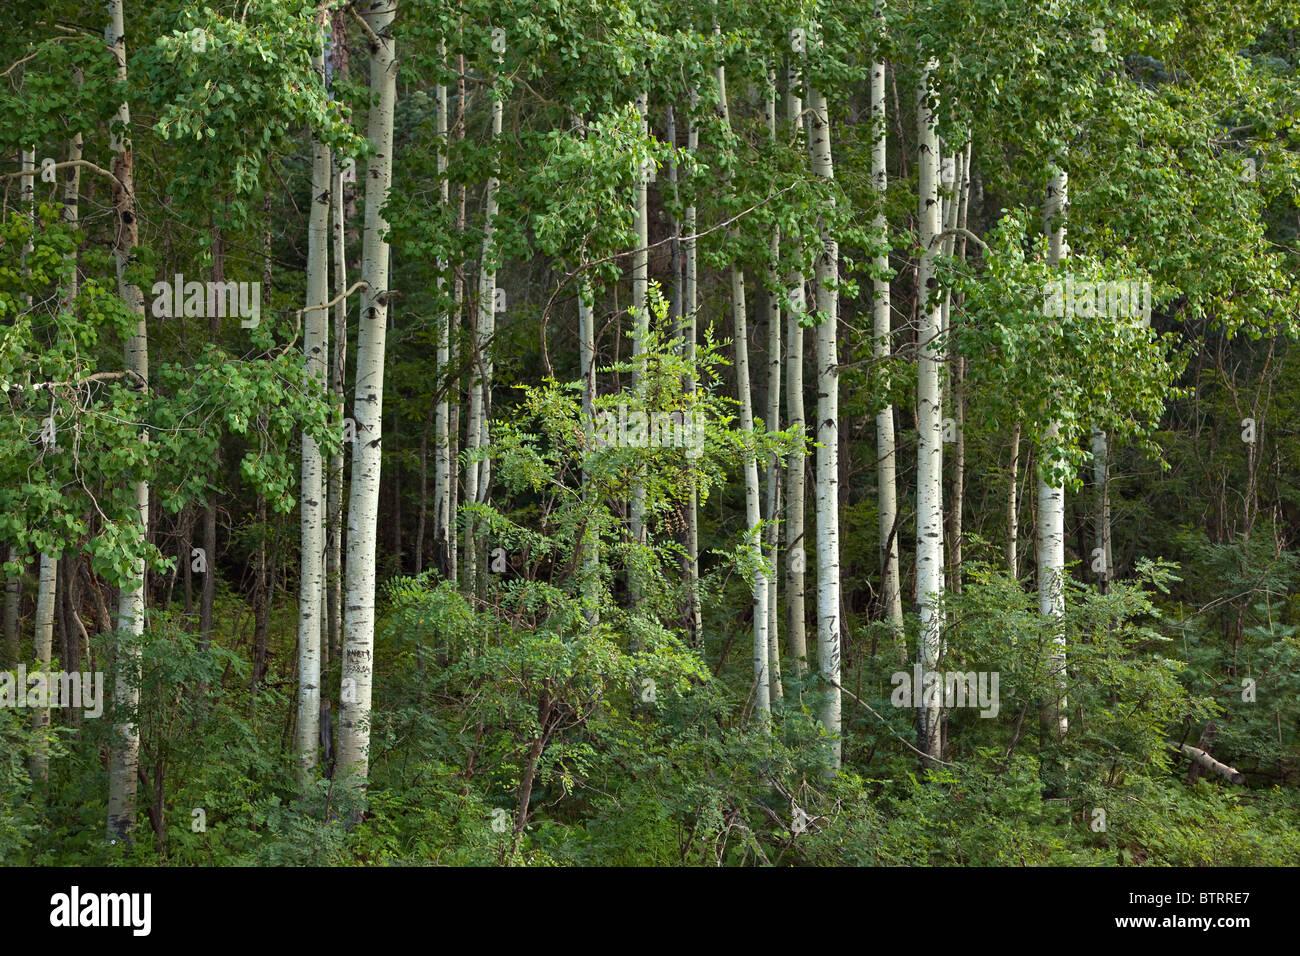 Aspen grove near Hawley Lake, Fort Apache Indian Reservation, Whiteriver, Arizona, USA - Stock Image